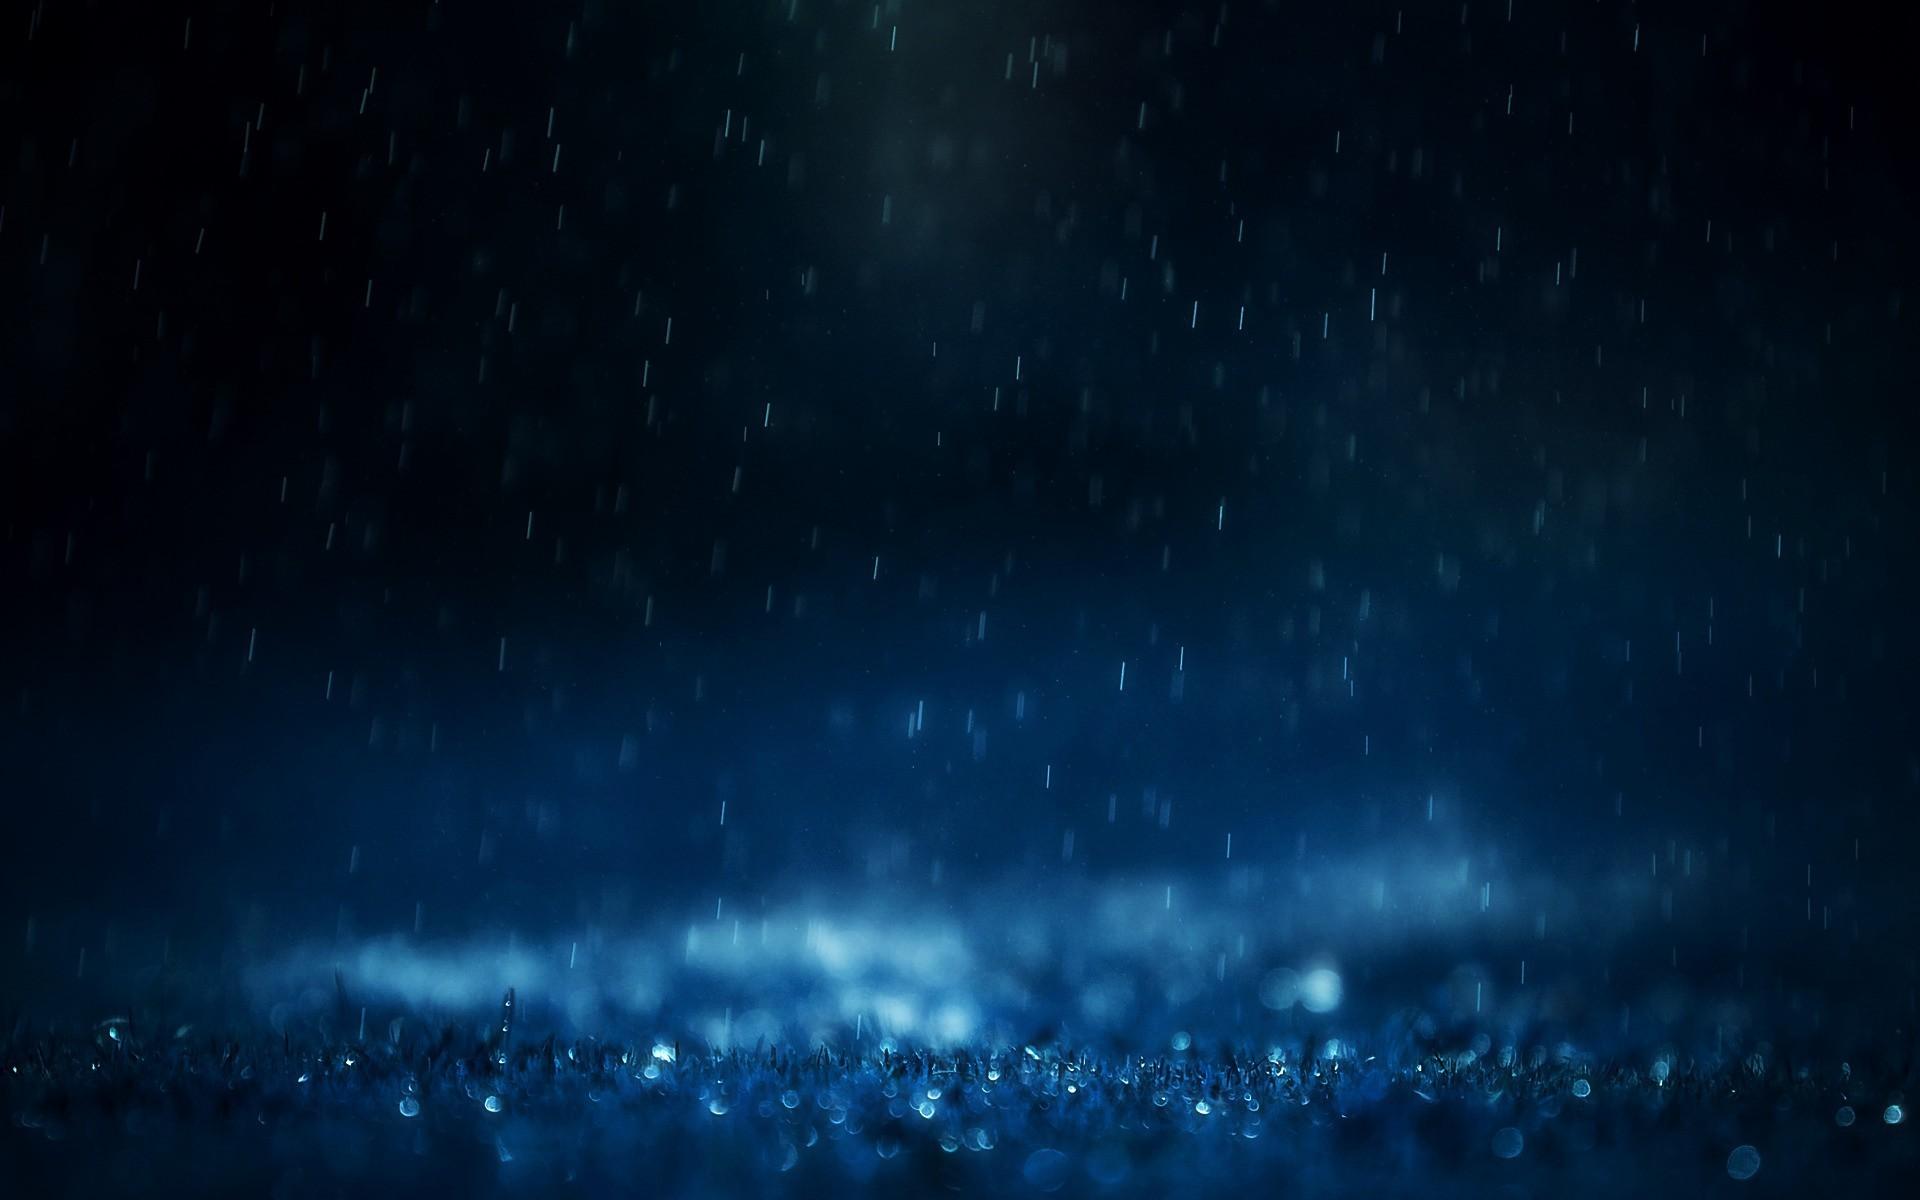 beautiful rain images. Â«Â«